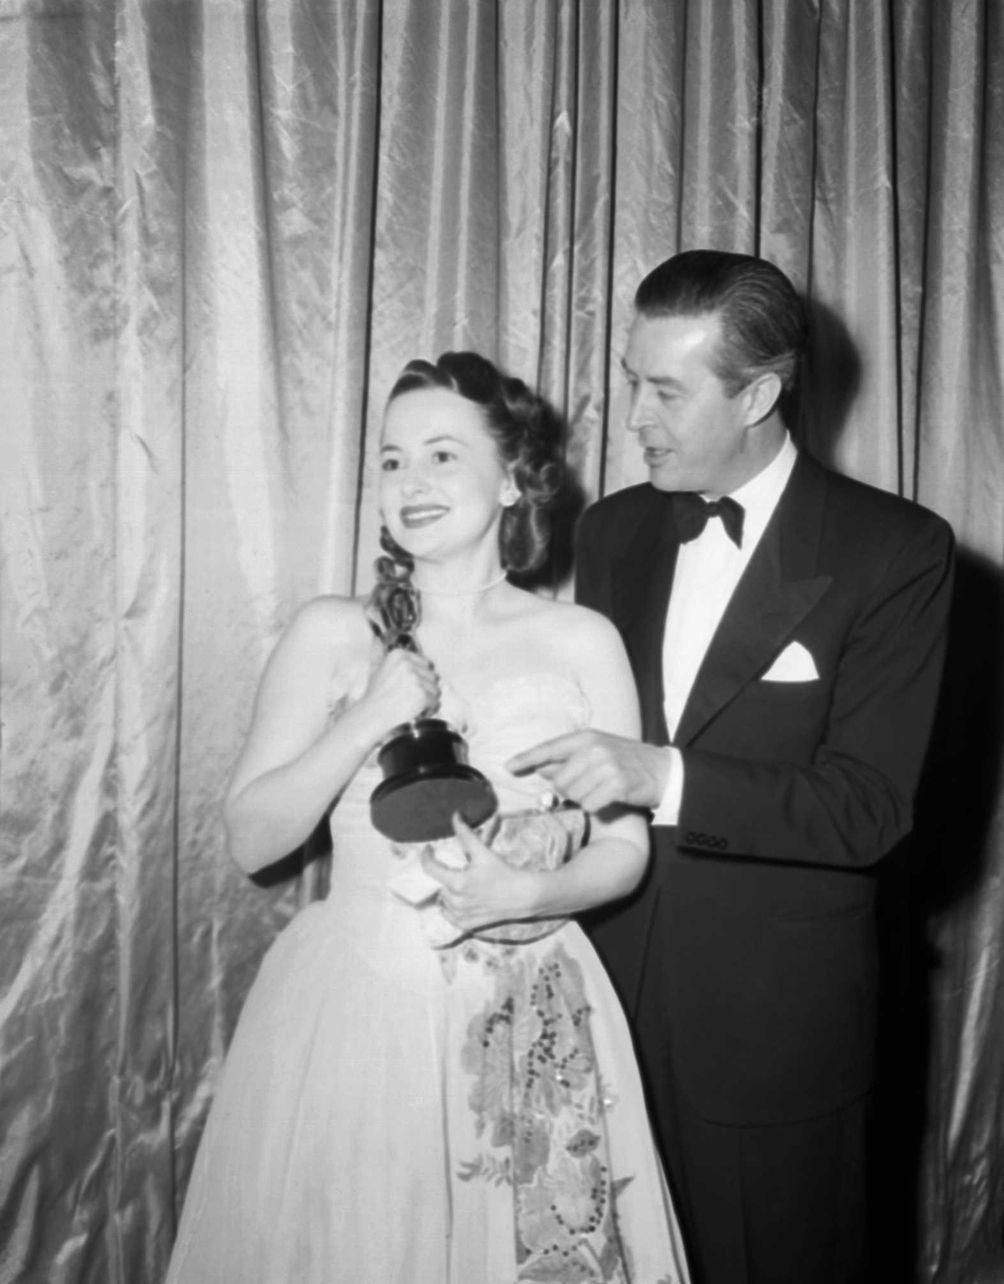 Olivia De Havilland (left) and Ray Milland, during